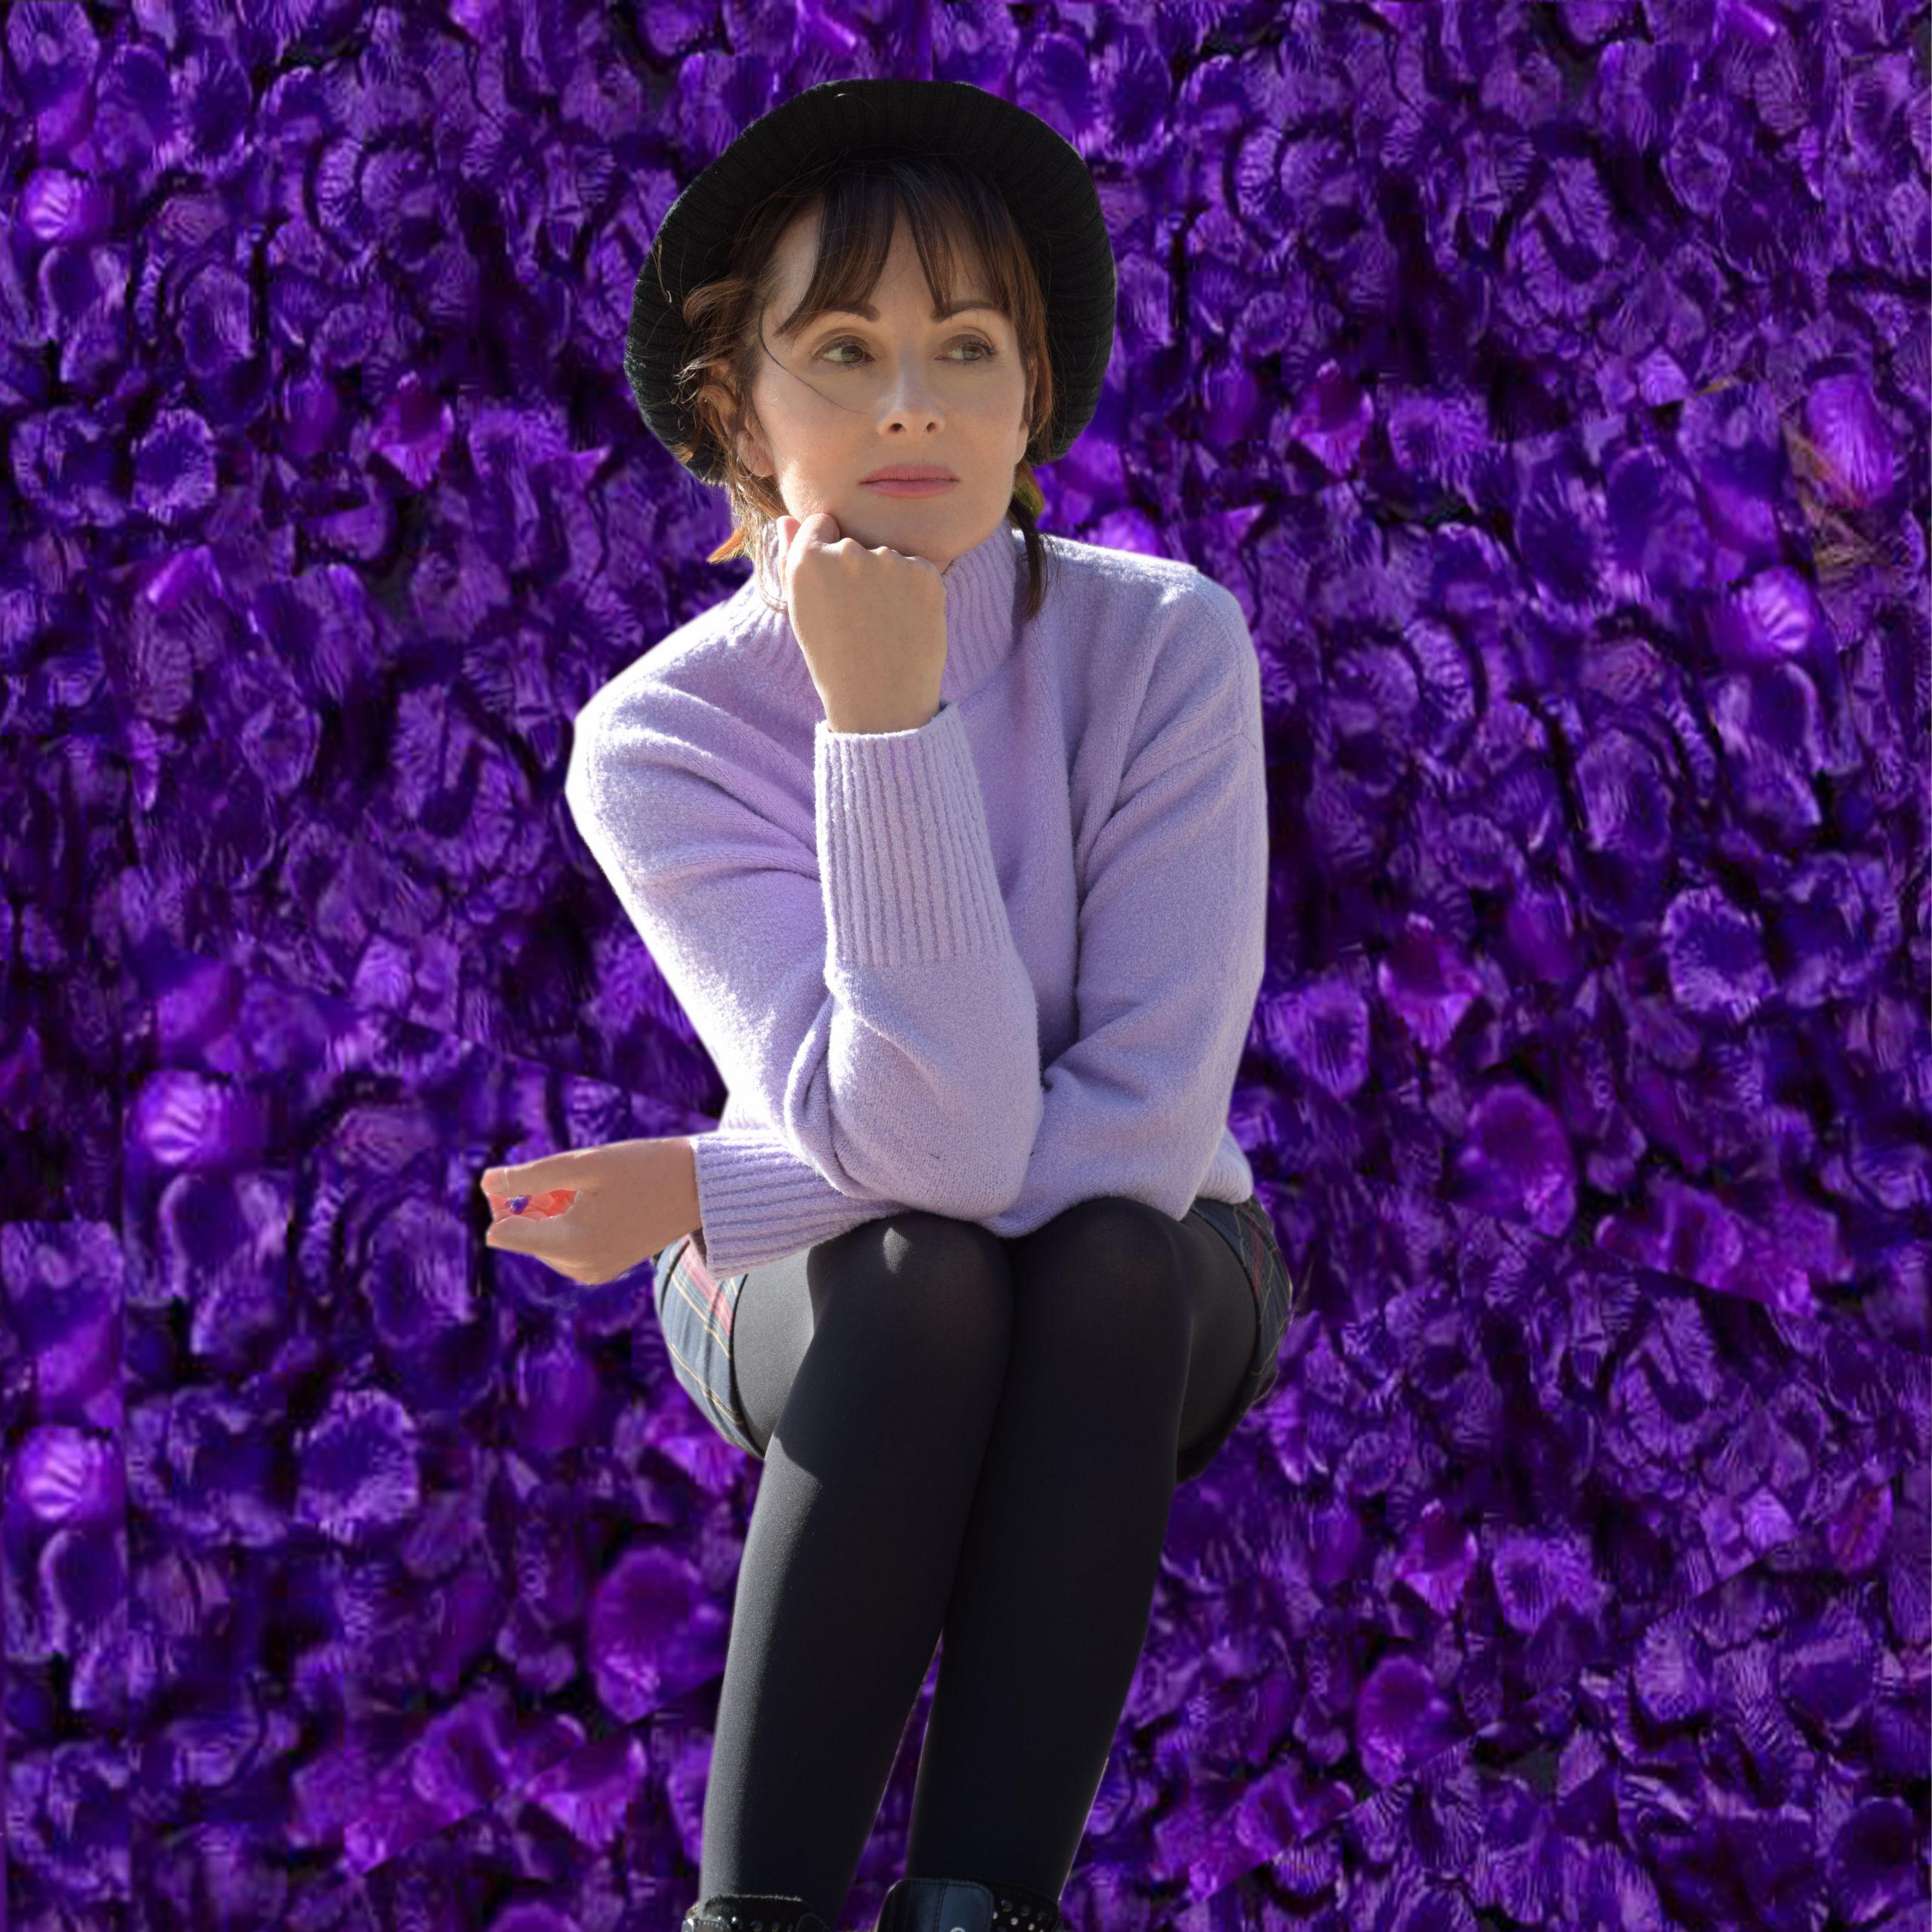 Nelly Berthele en violet